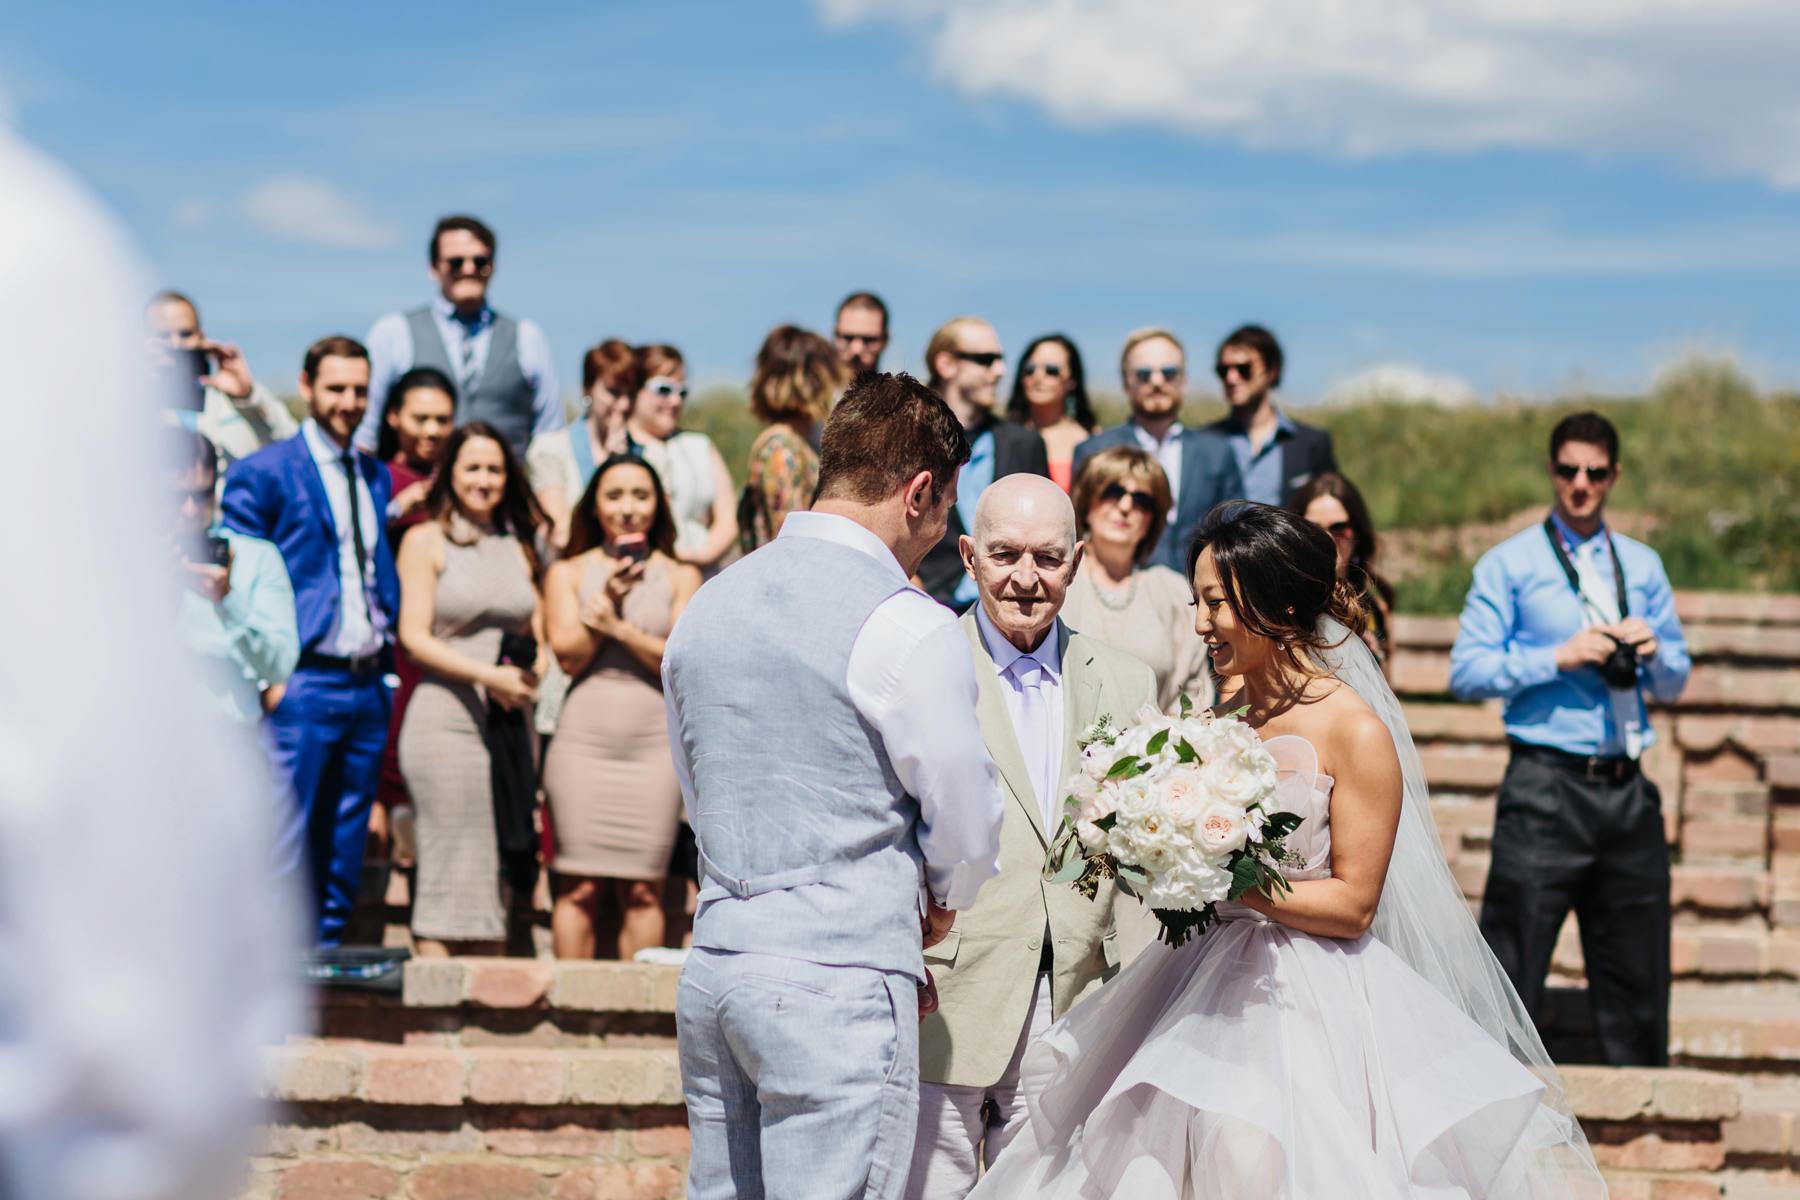 Vail Colorado Wedding Deck_ Kindling Wedding Photography33.JPG